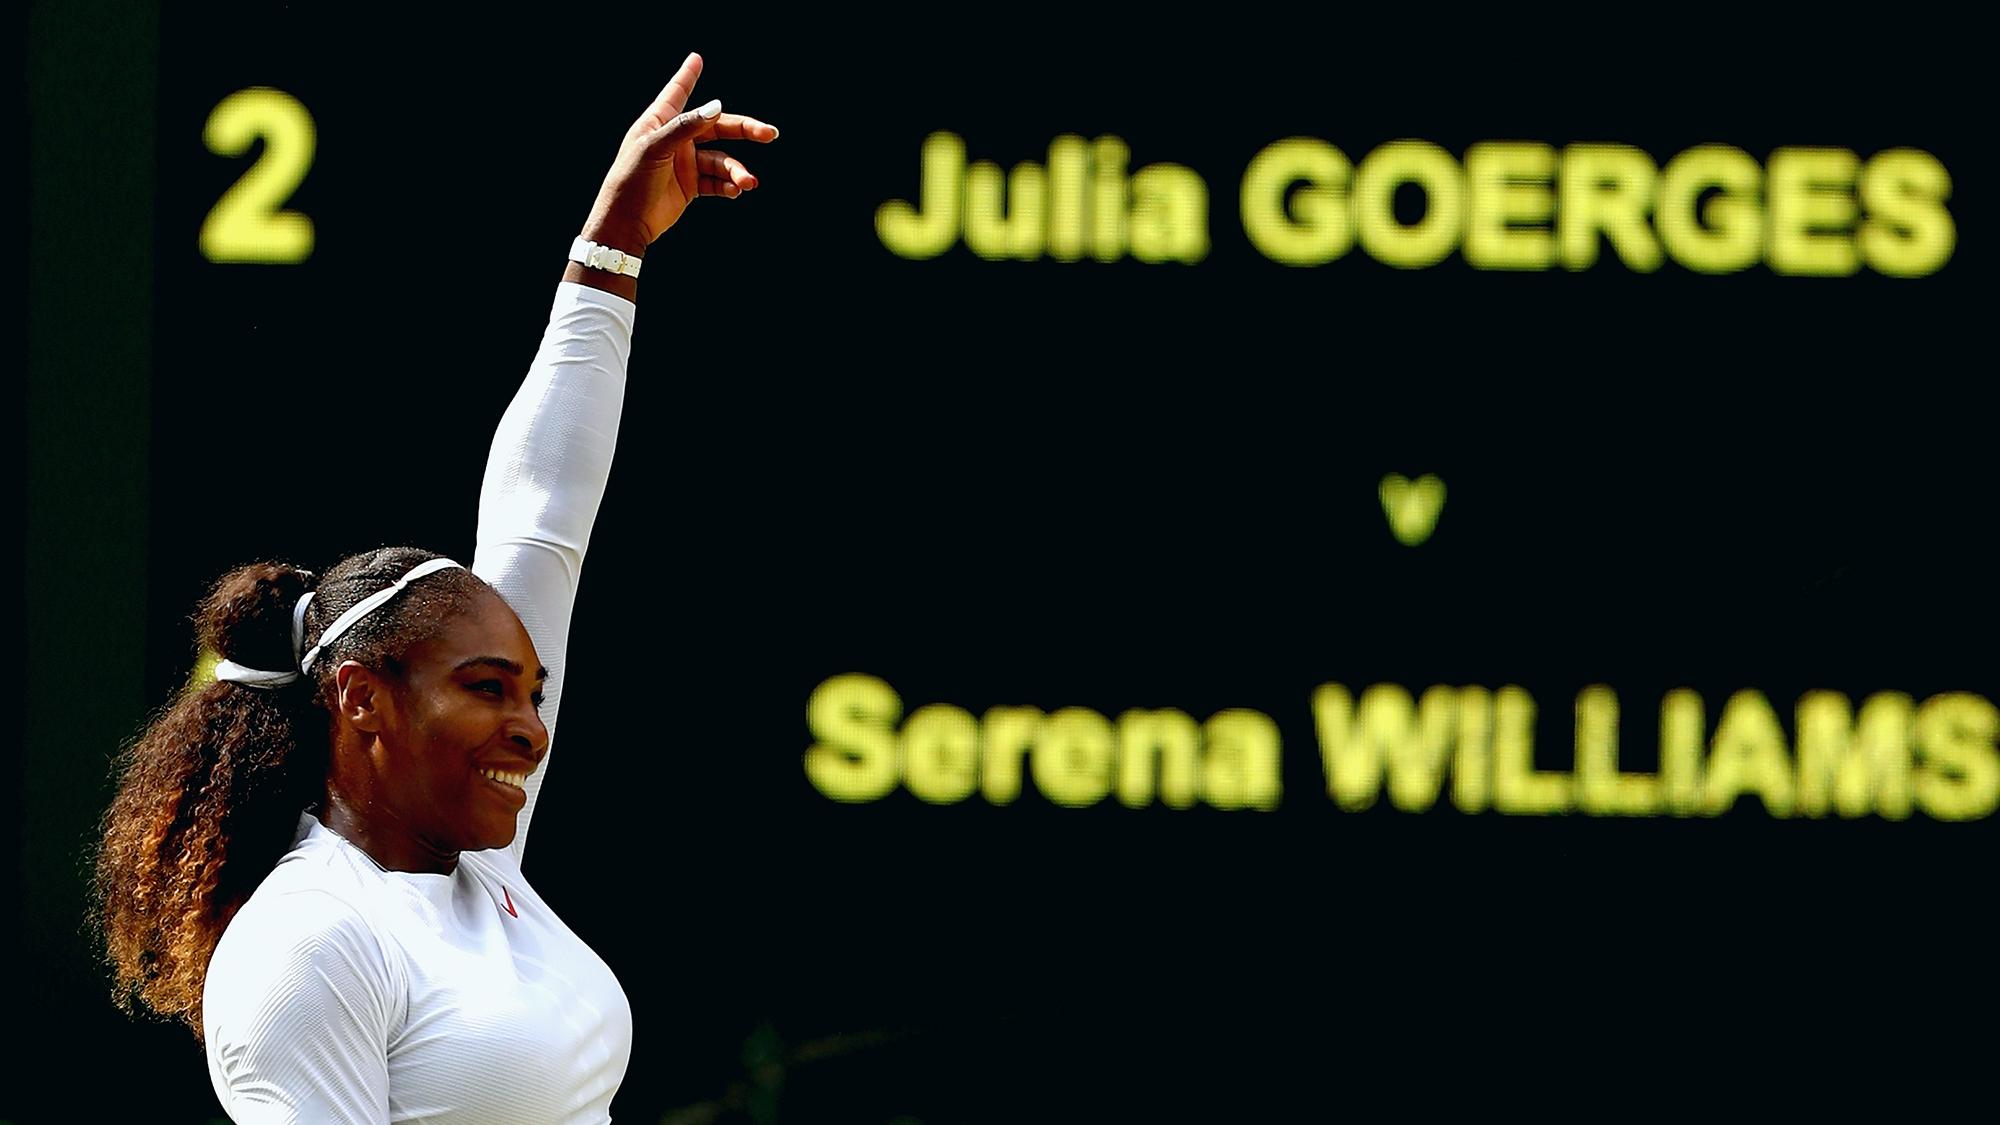 serena williams julia goerges wimbledon semifinals